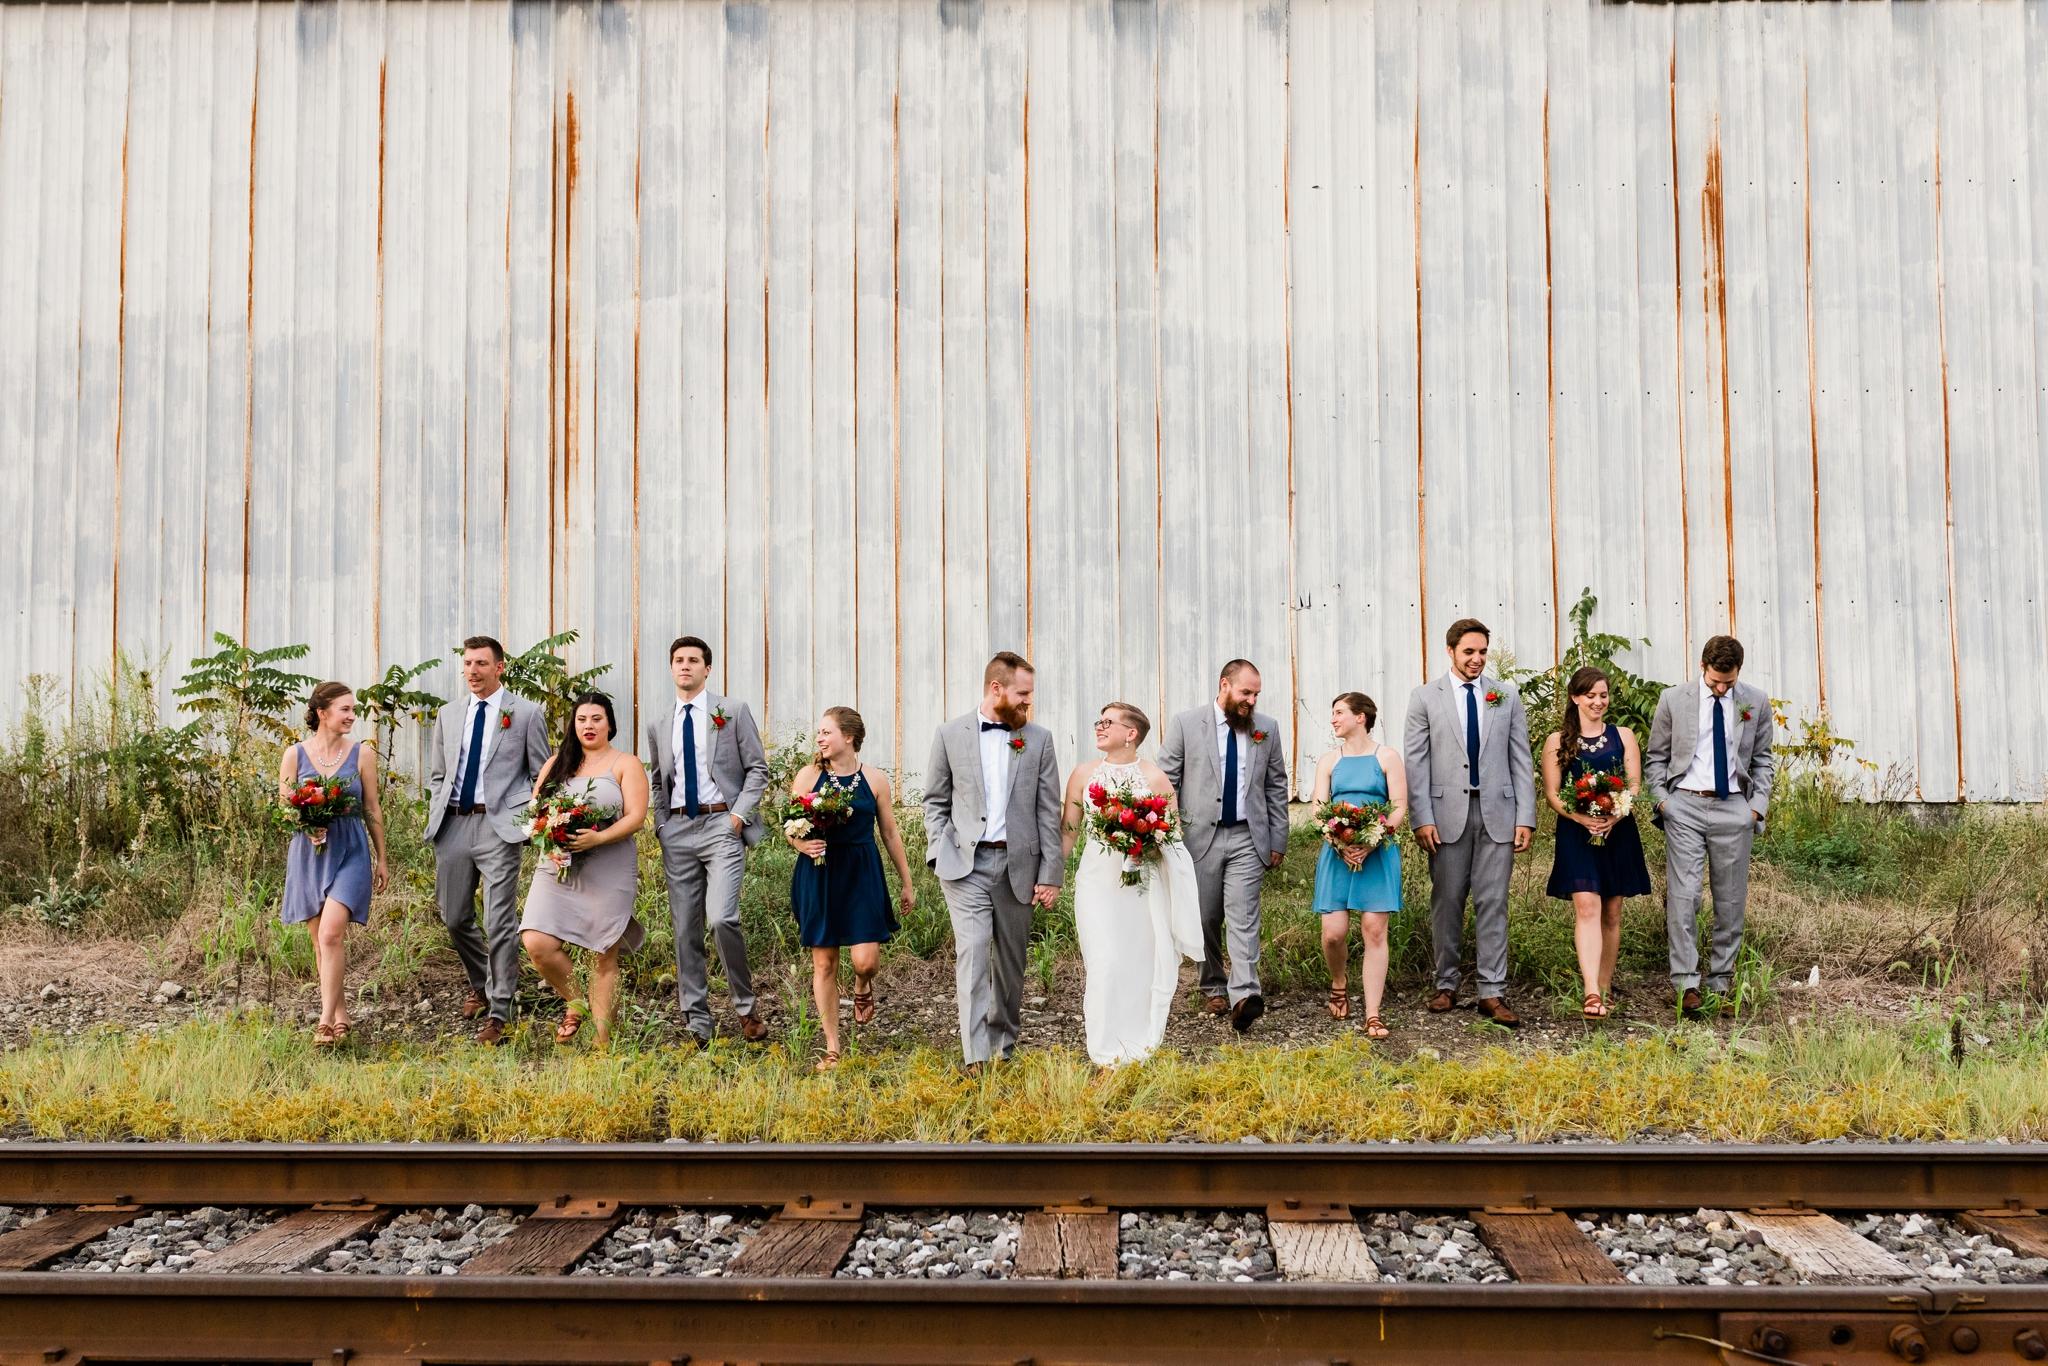 Emily Grace Photography, Lancaster PA Wedding Photographer, The Booking House Wedding Venue, Manheim PA Wedding Venue, The Booking House Manheim Bridal Party Photos, Central PA Wedding Photographer